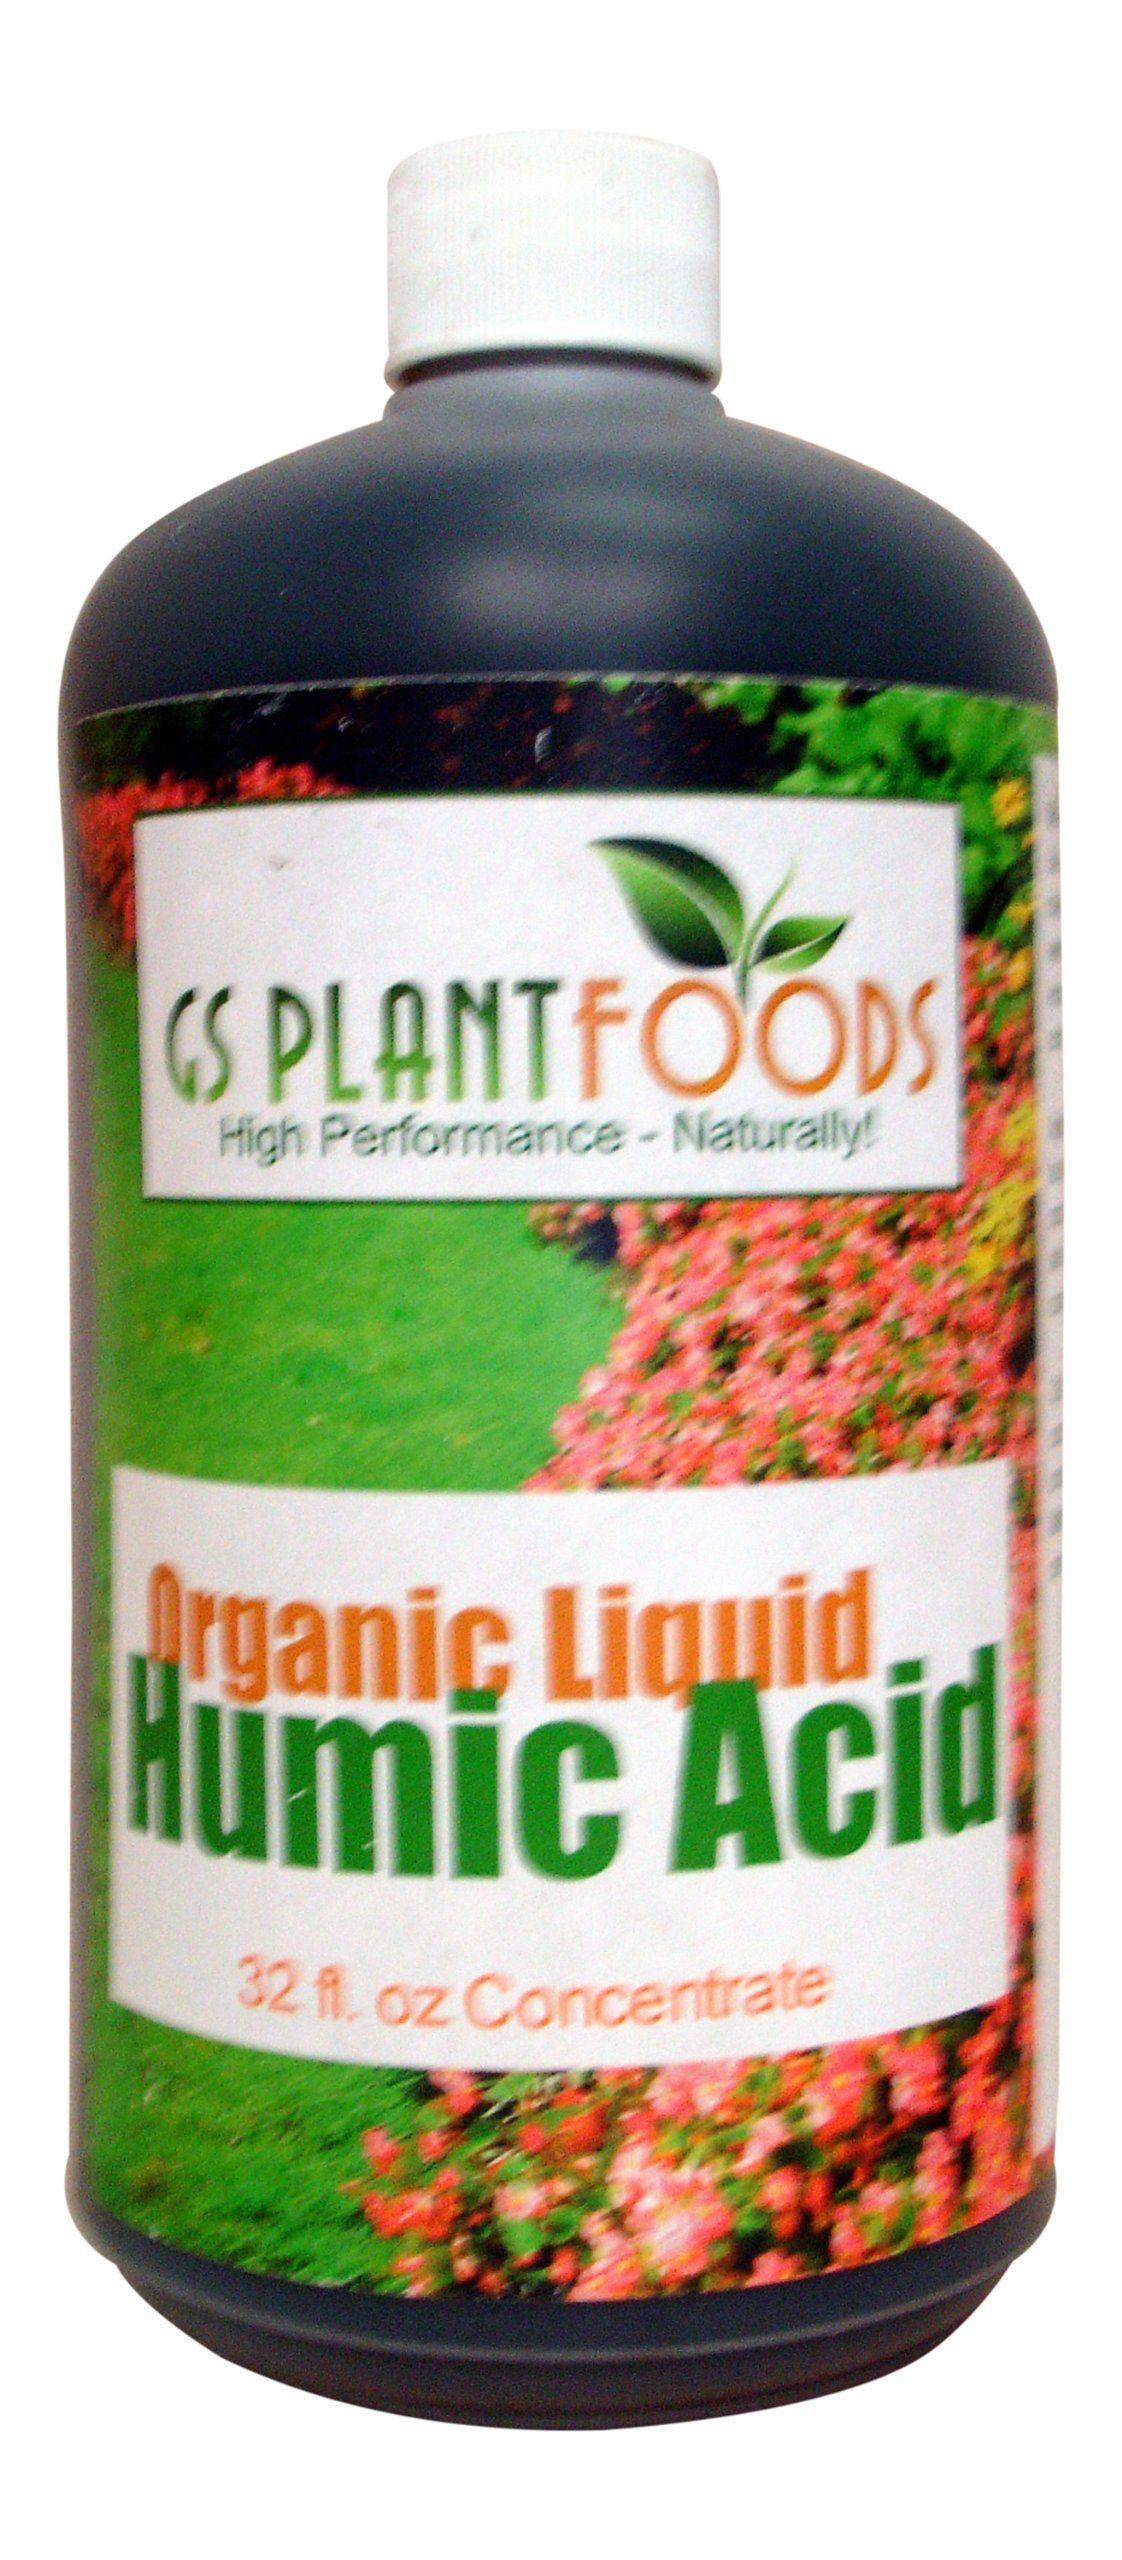 Organic Liquid Humic Acid 32 Fl Oz Concentrate